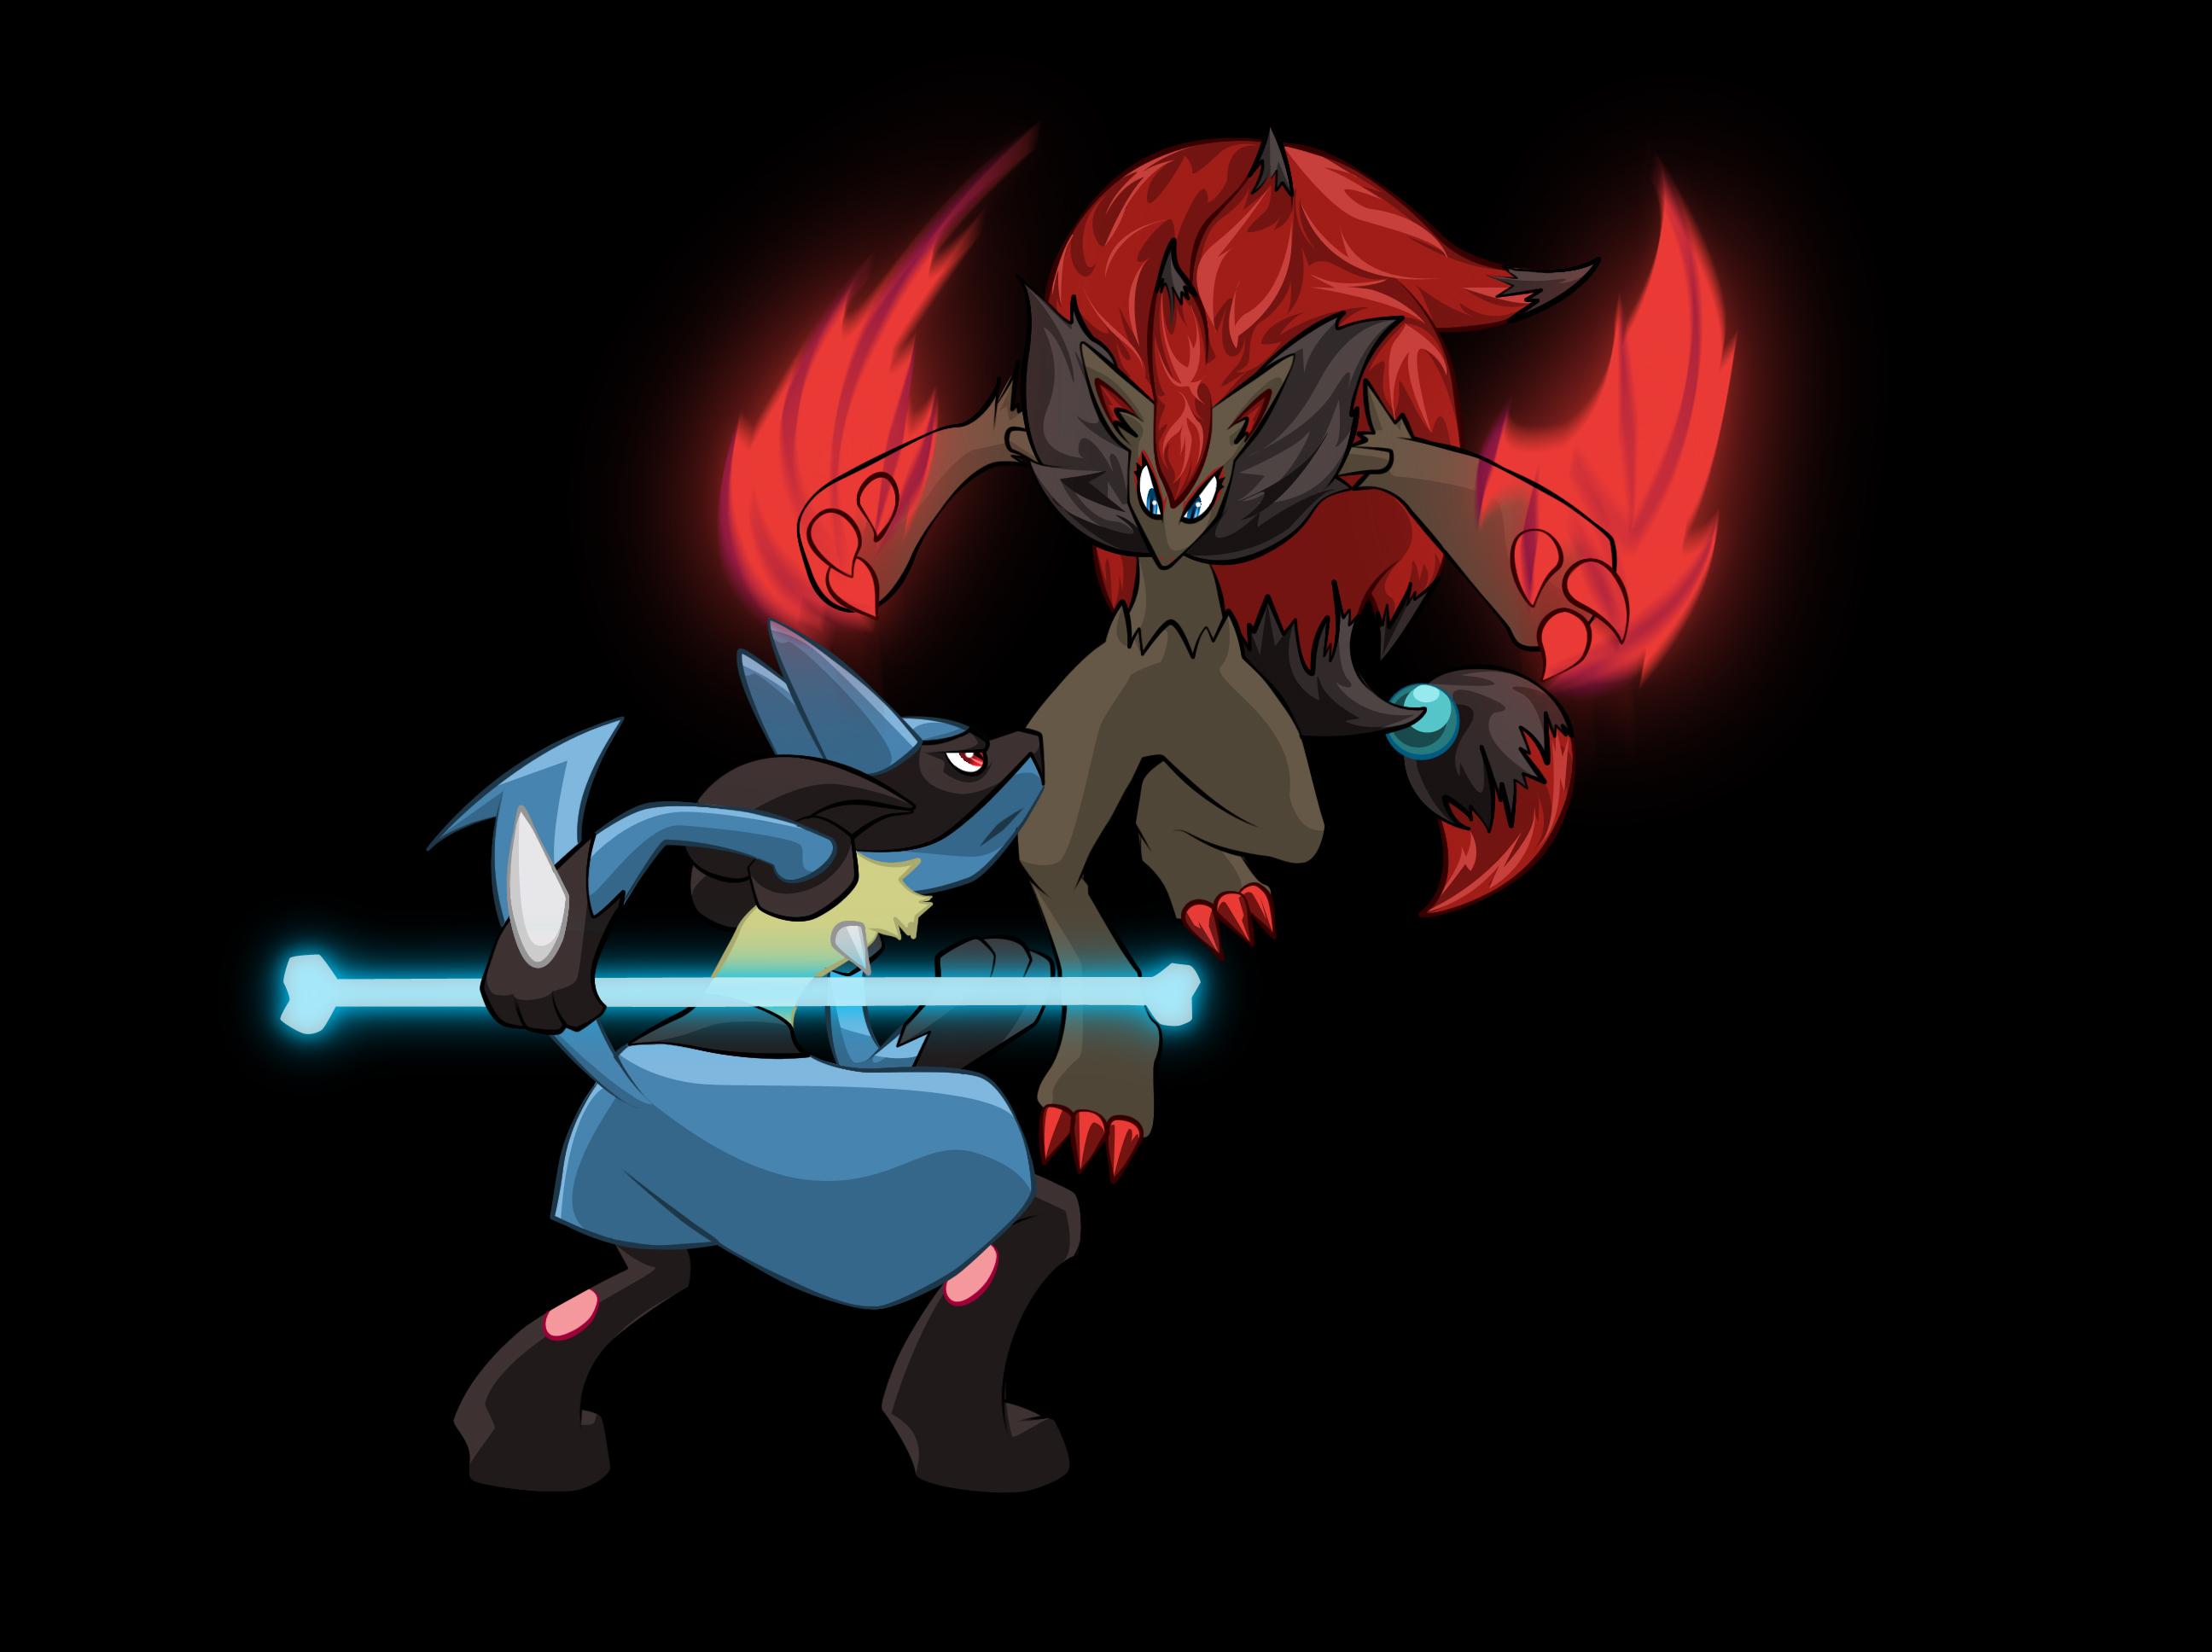 Lucario Vs Zoroark Vs Mewtwo | www.imgkid.com - The Image ...